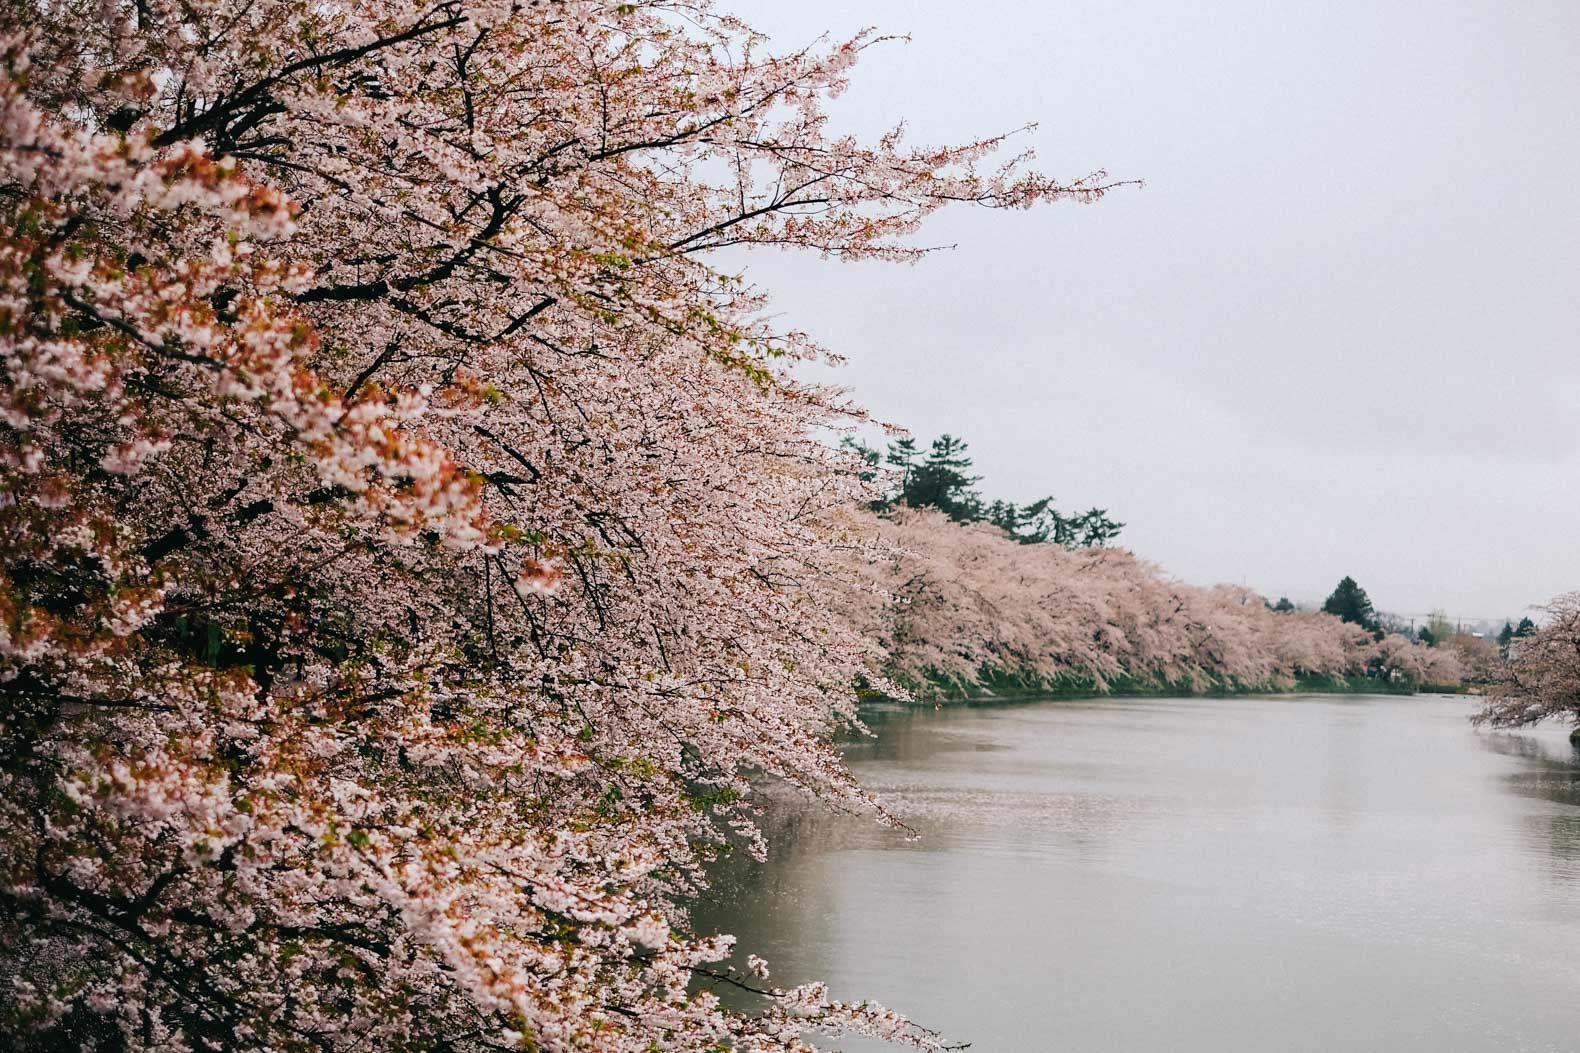 Northern Japan S 2 500 Tree Cherry Blossom Wonderland Japan Travel Japan Cherry Blossom Japan